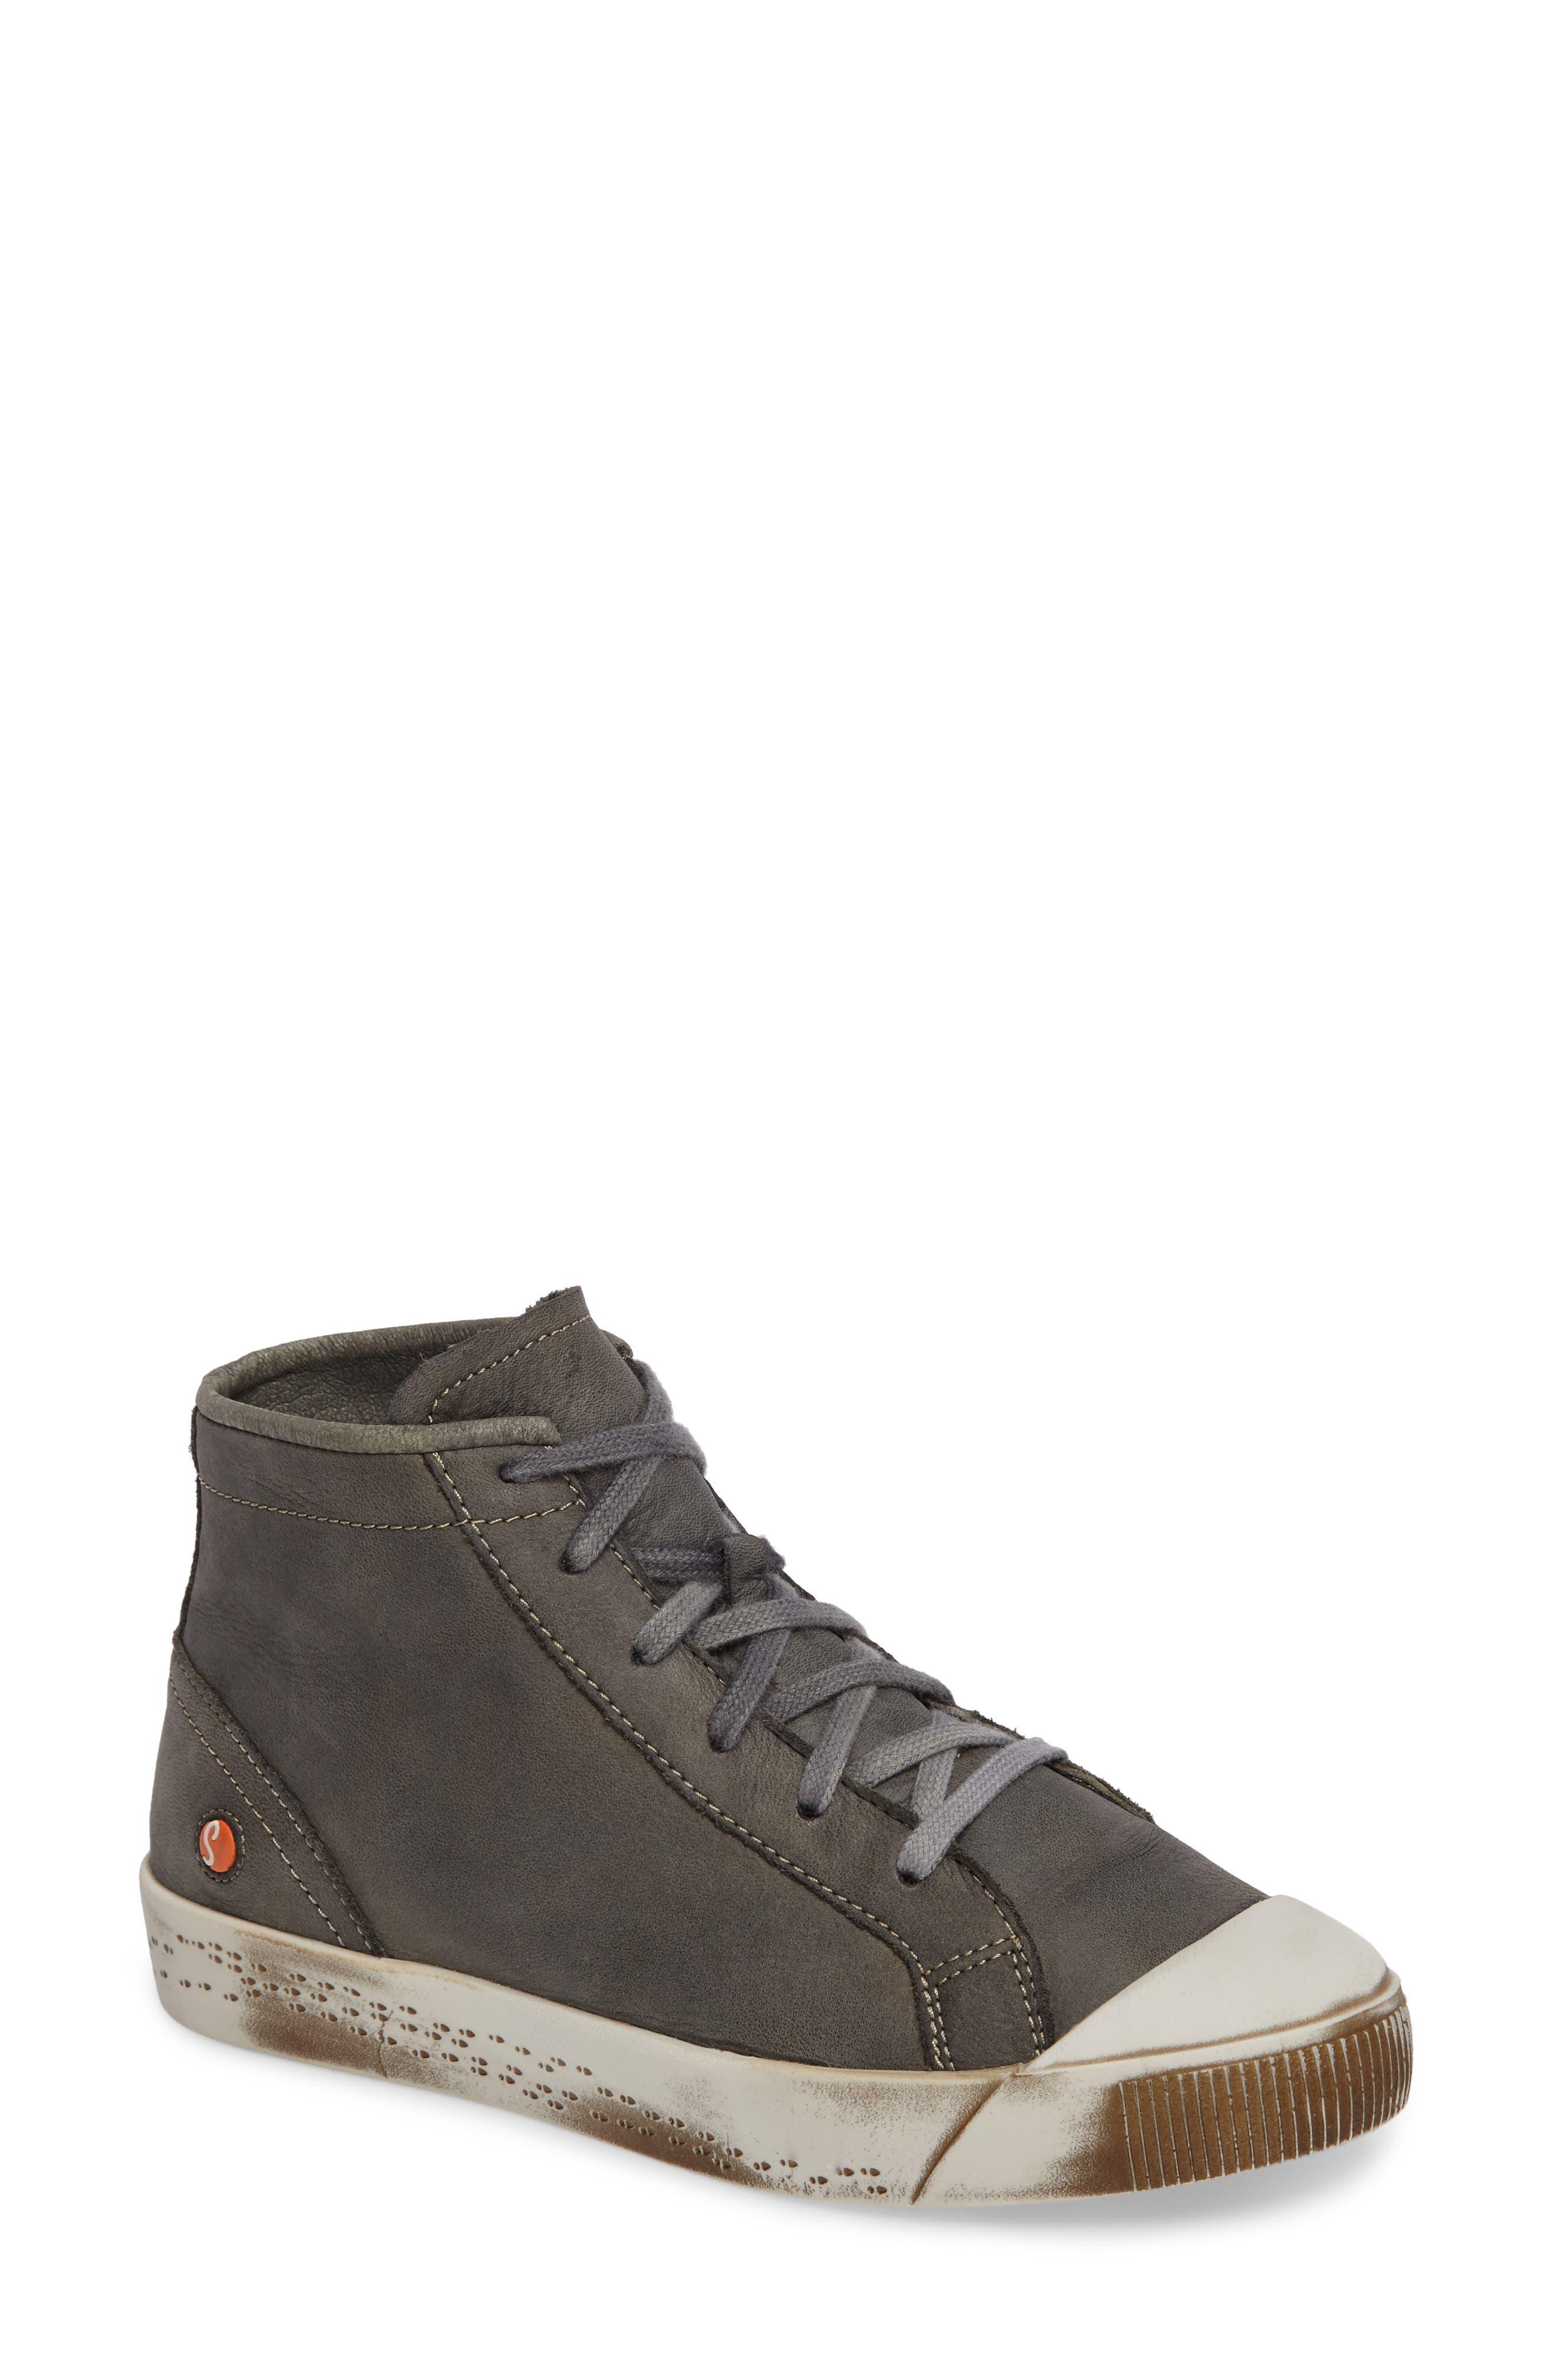 Kip High Top Sneaker,                             Main thumbnail 1, color,                             Military Leather